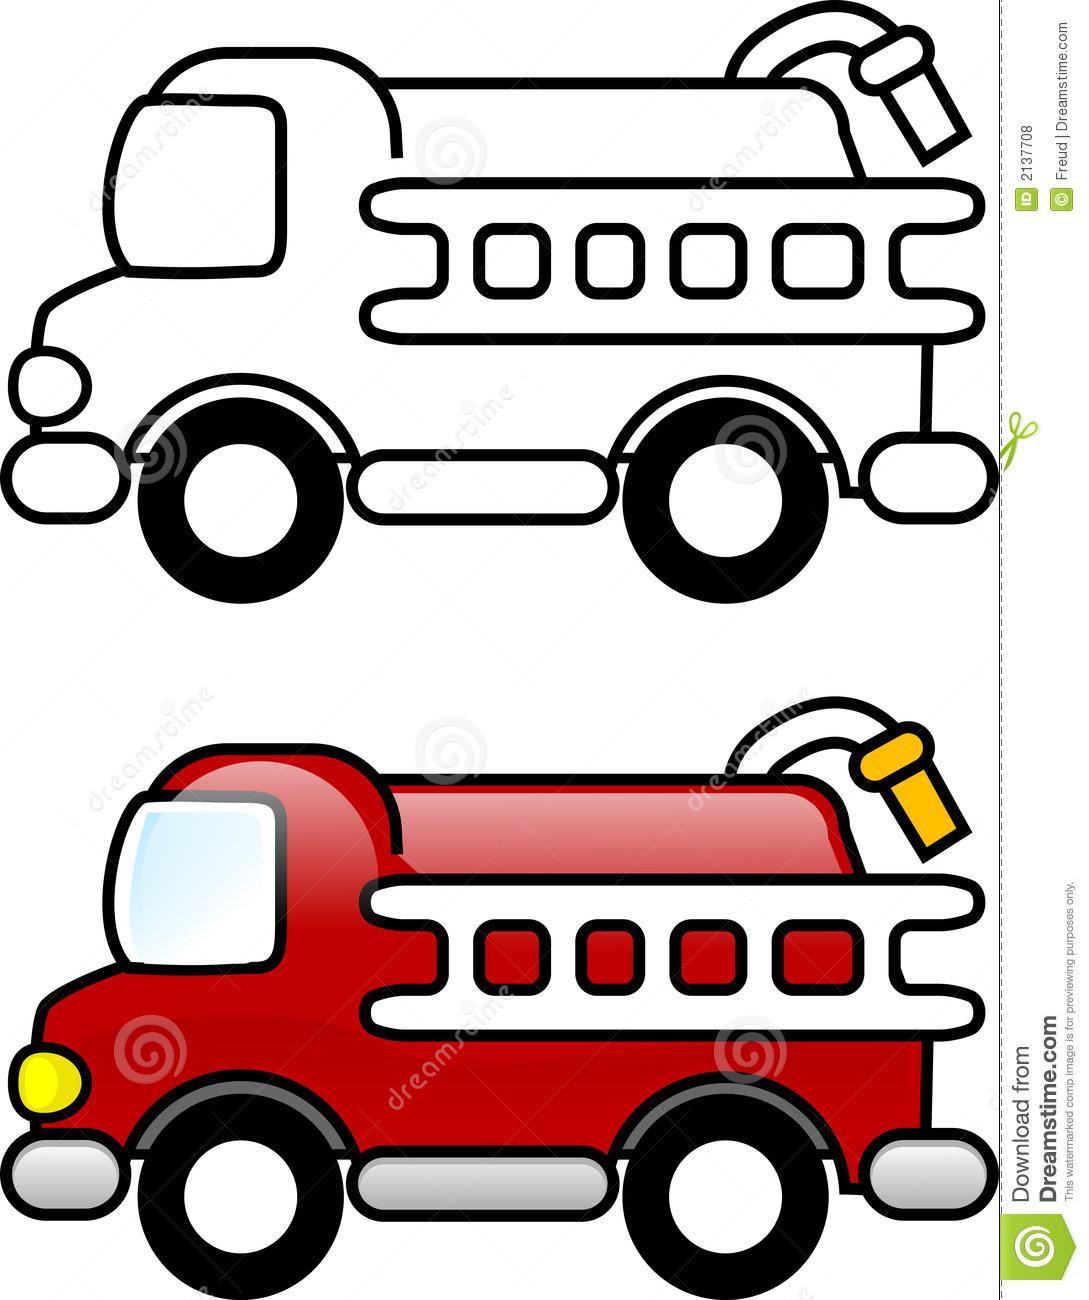 1089x1300 Free Clipart Fire Truck